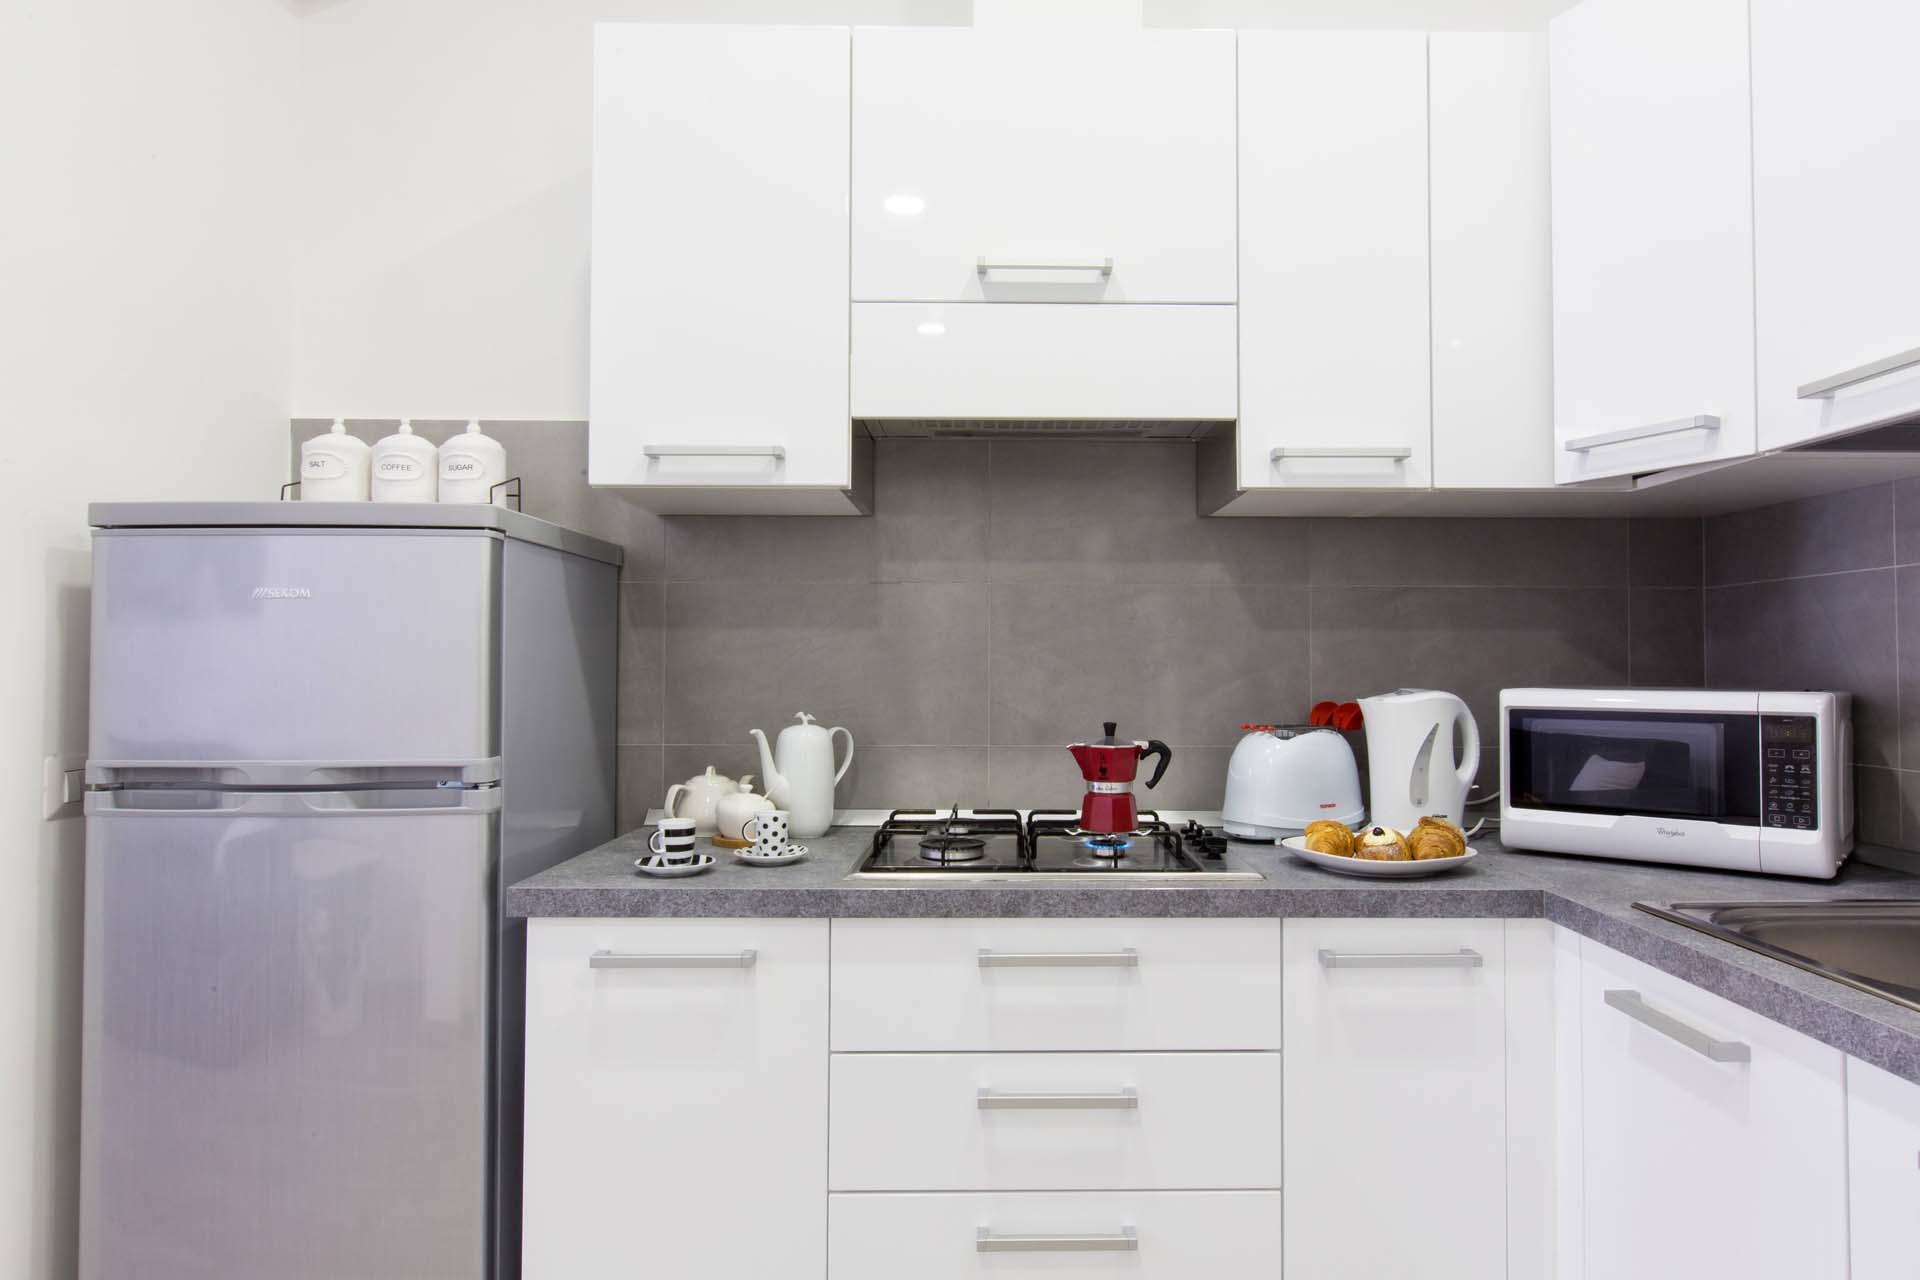 Conny's luxury maison kitchen